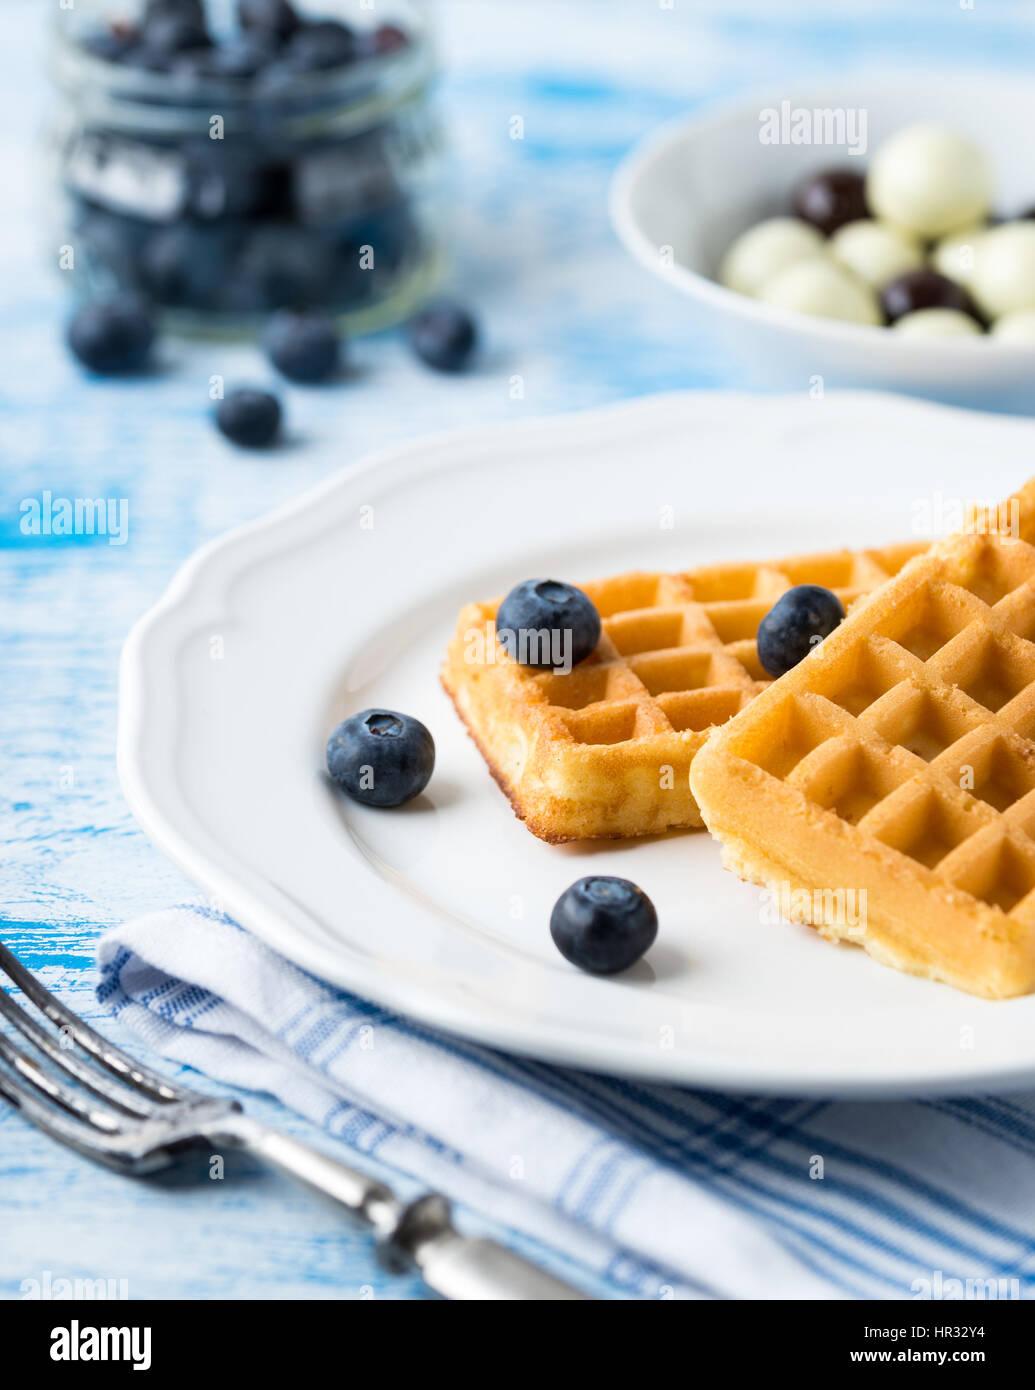 Belgian waffles on white plate on light blue background. - Stock Image